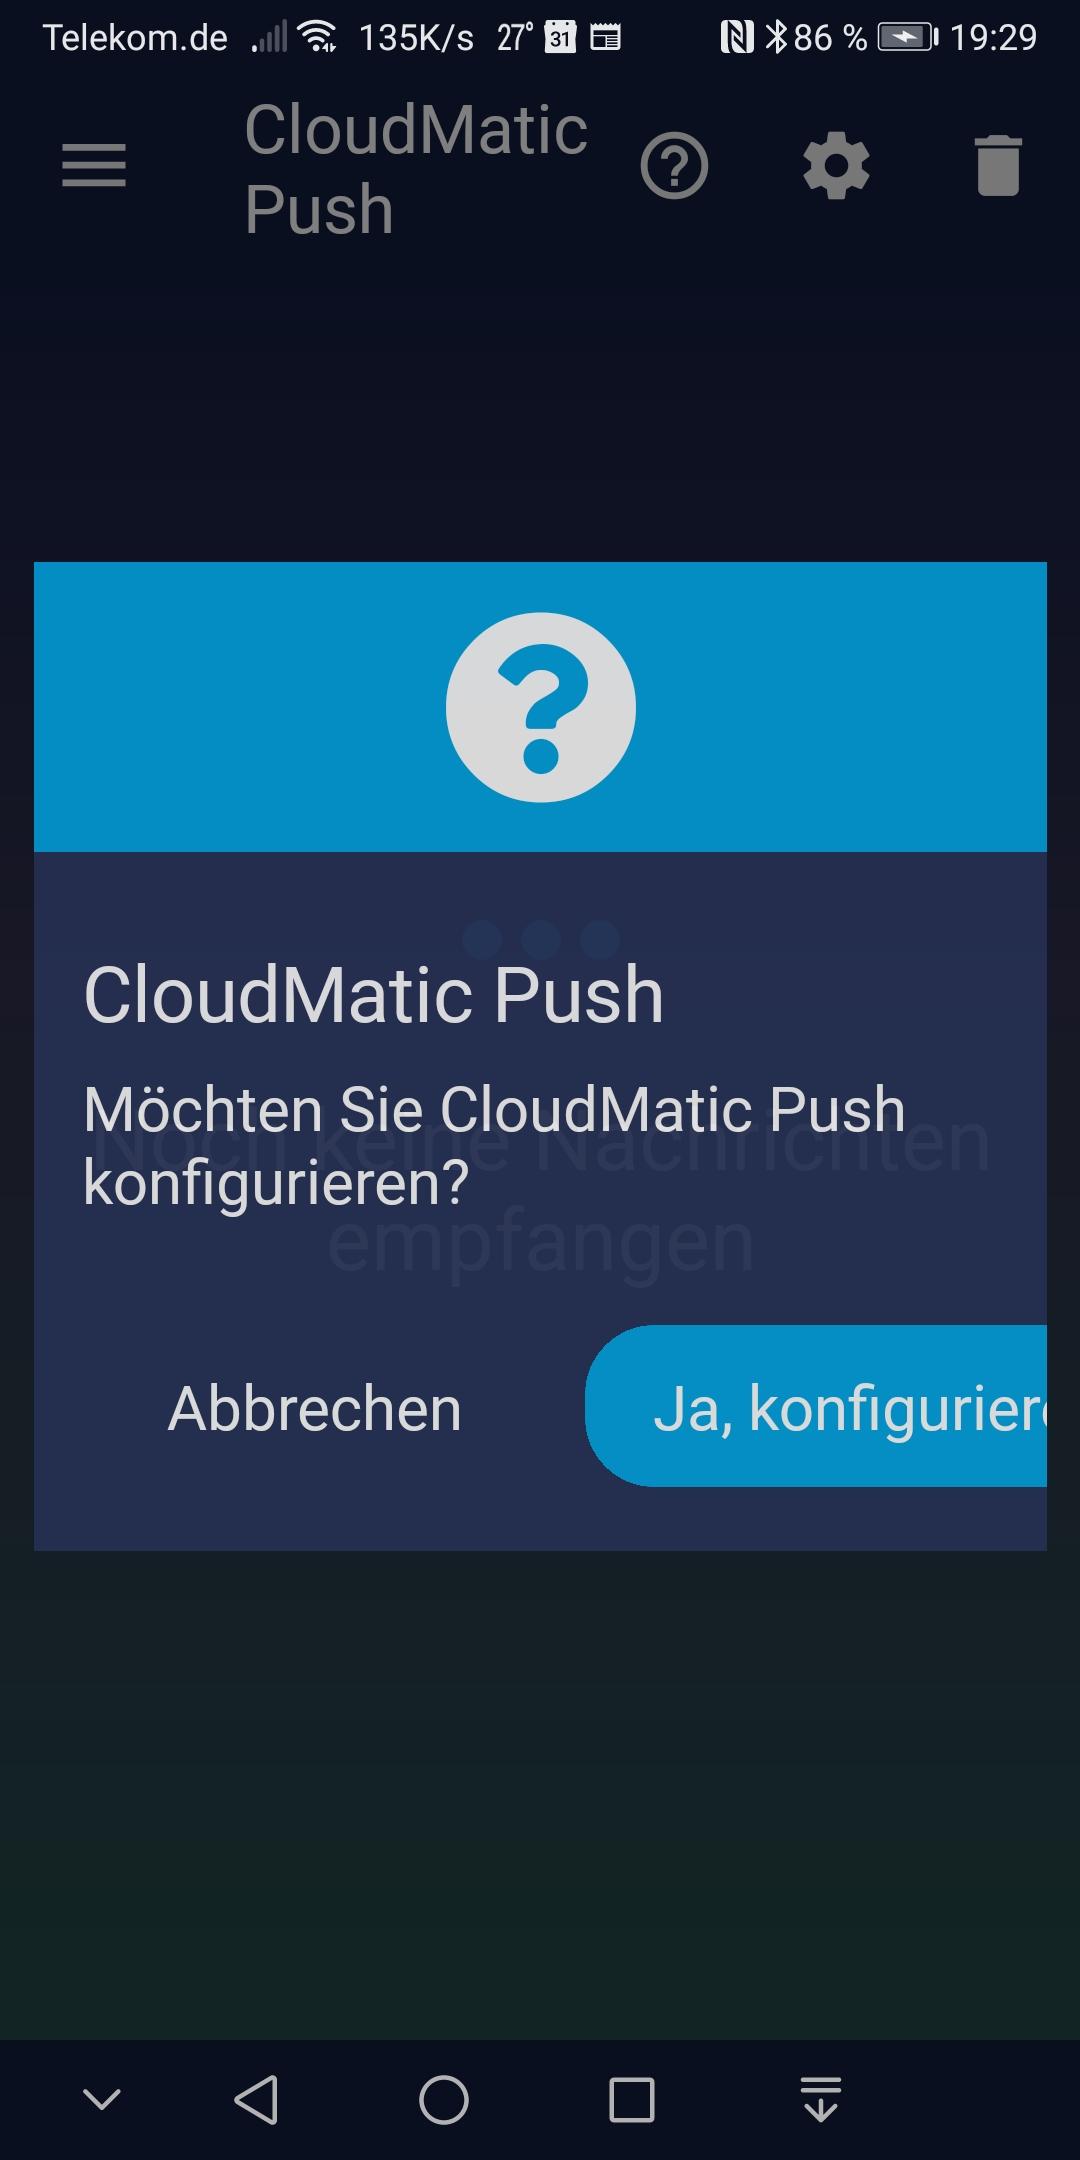 Screenshot_20200811_192909_com.easysmarthome.cloudmaticapp